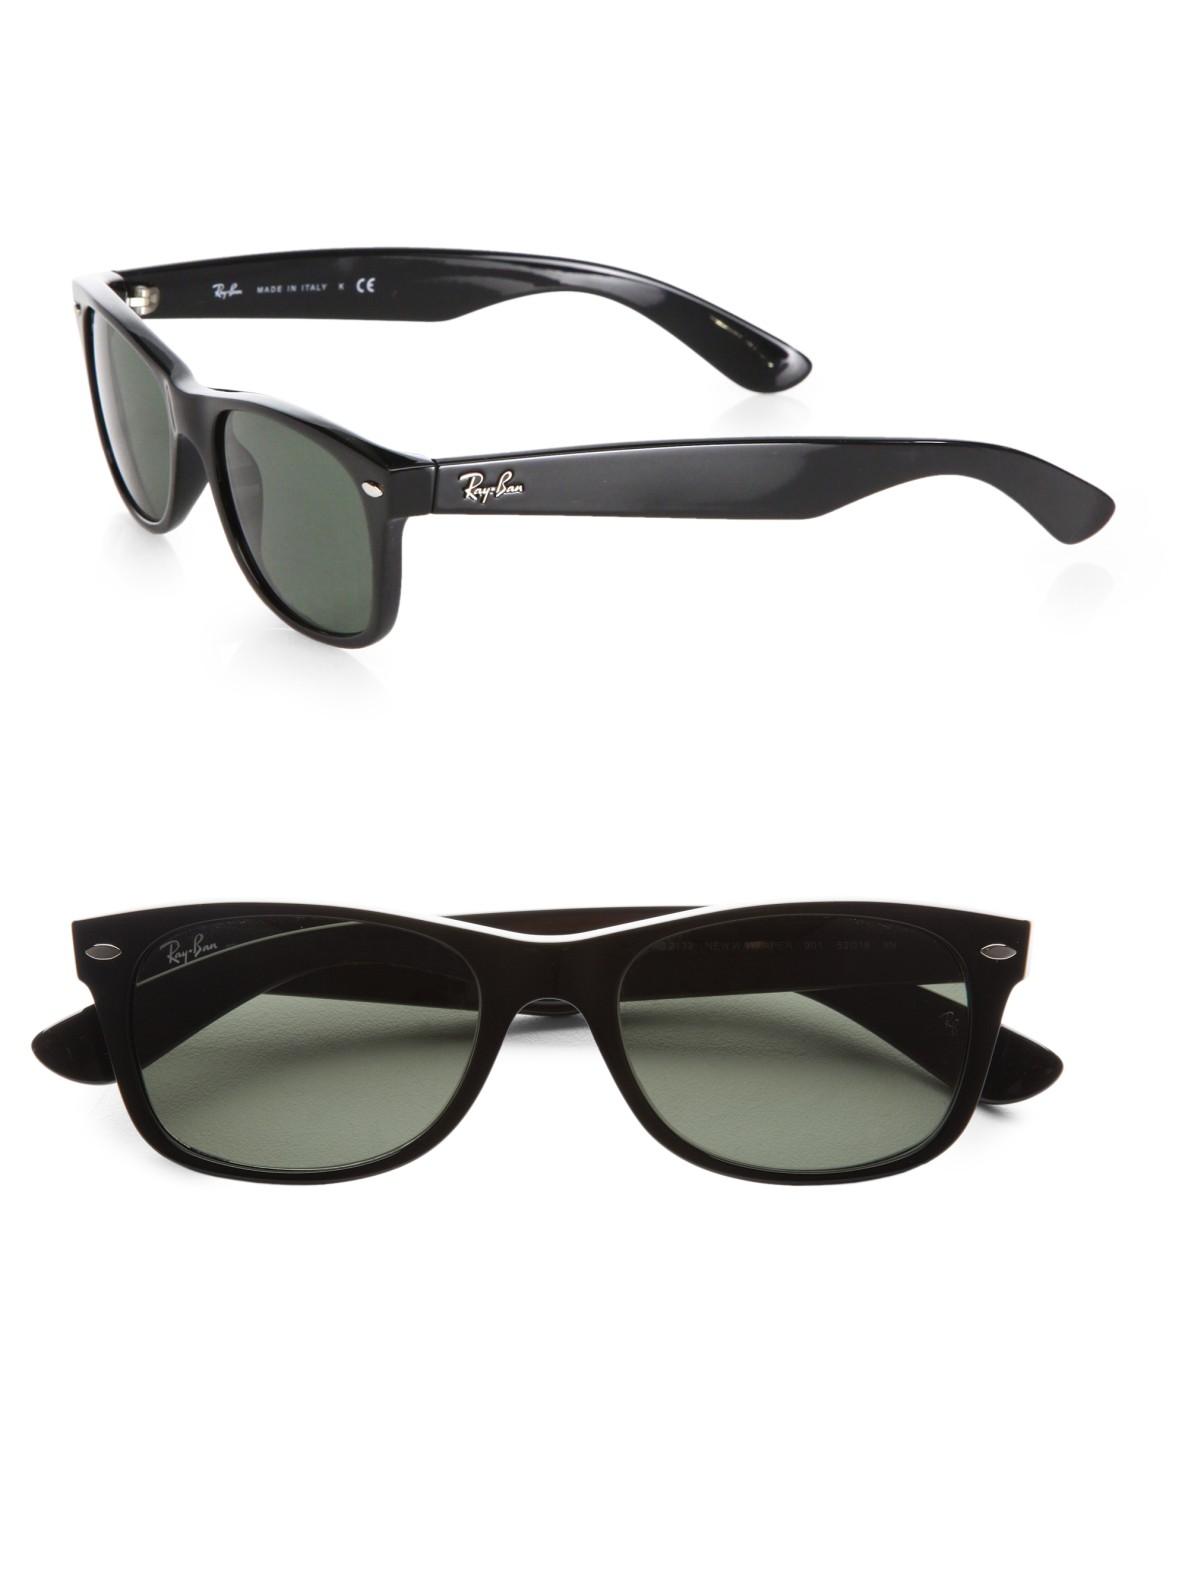 ray ban new wayfarer sunglasses in black for men lyst. Black Bedroom Furniture Sets. Home Design Ideas